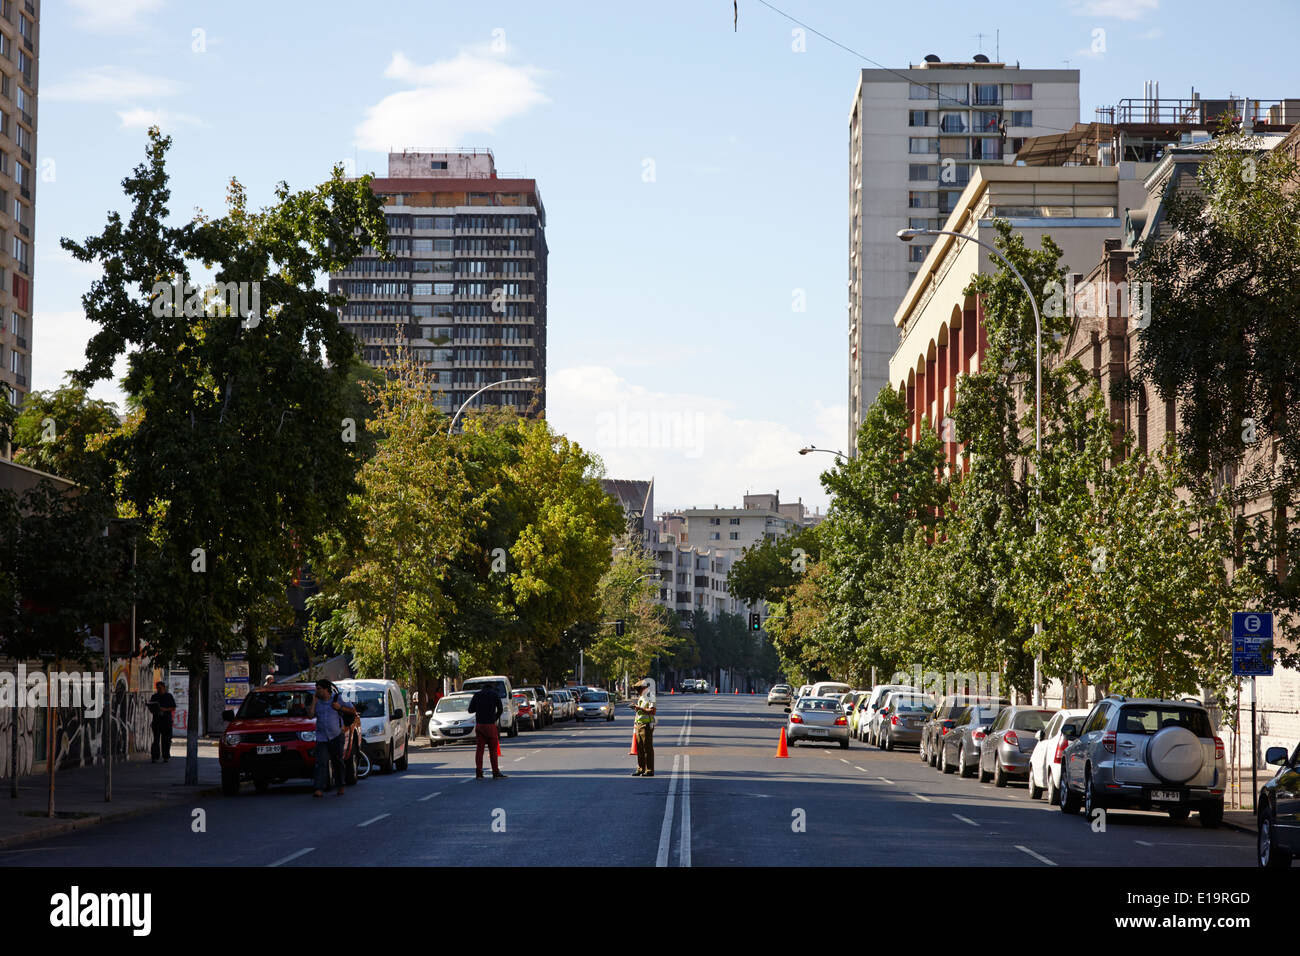 avenida portugal wide city street in Santiago Chile - Stock Image